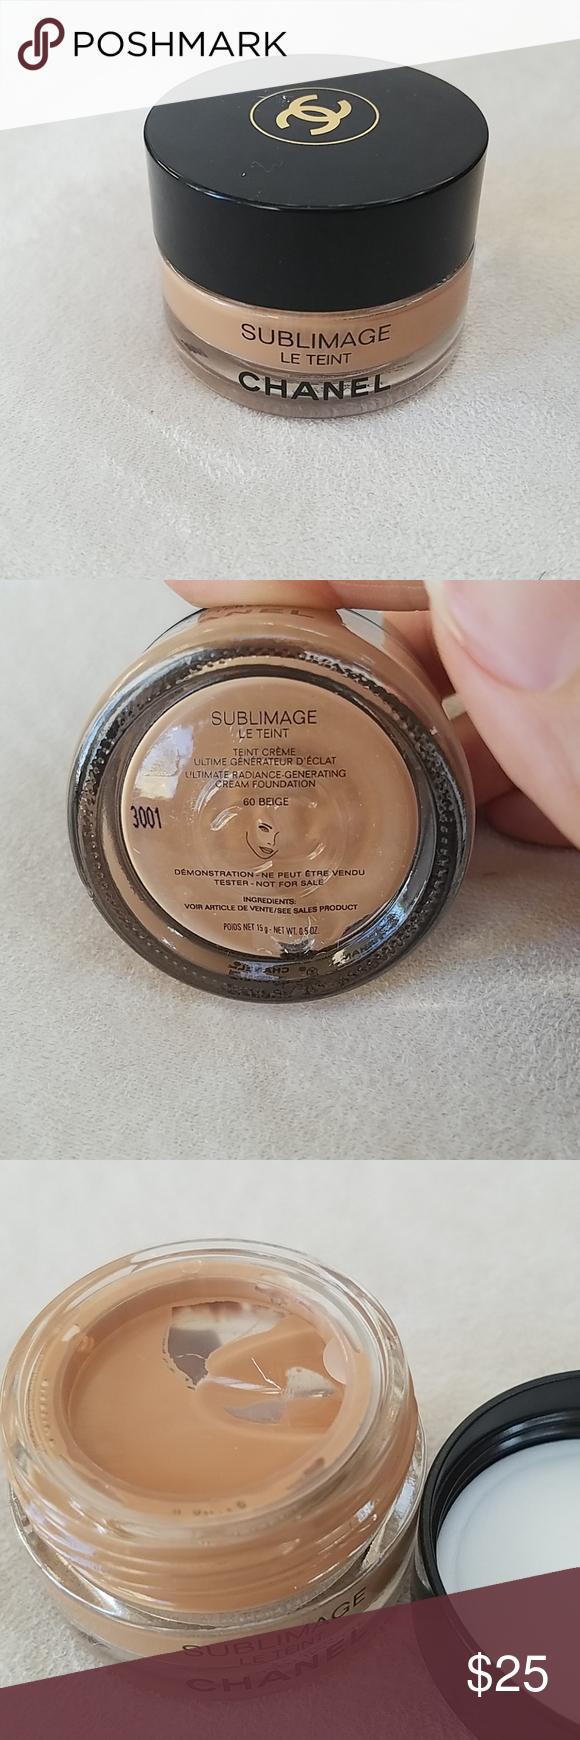 CHANEL makeup Chanel makeup foundation, Chanel makeup